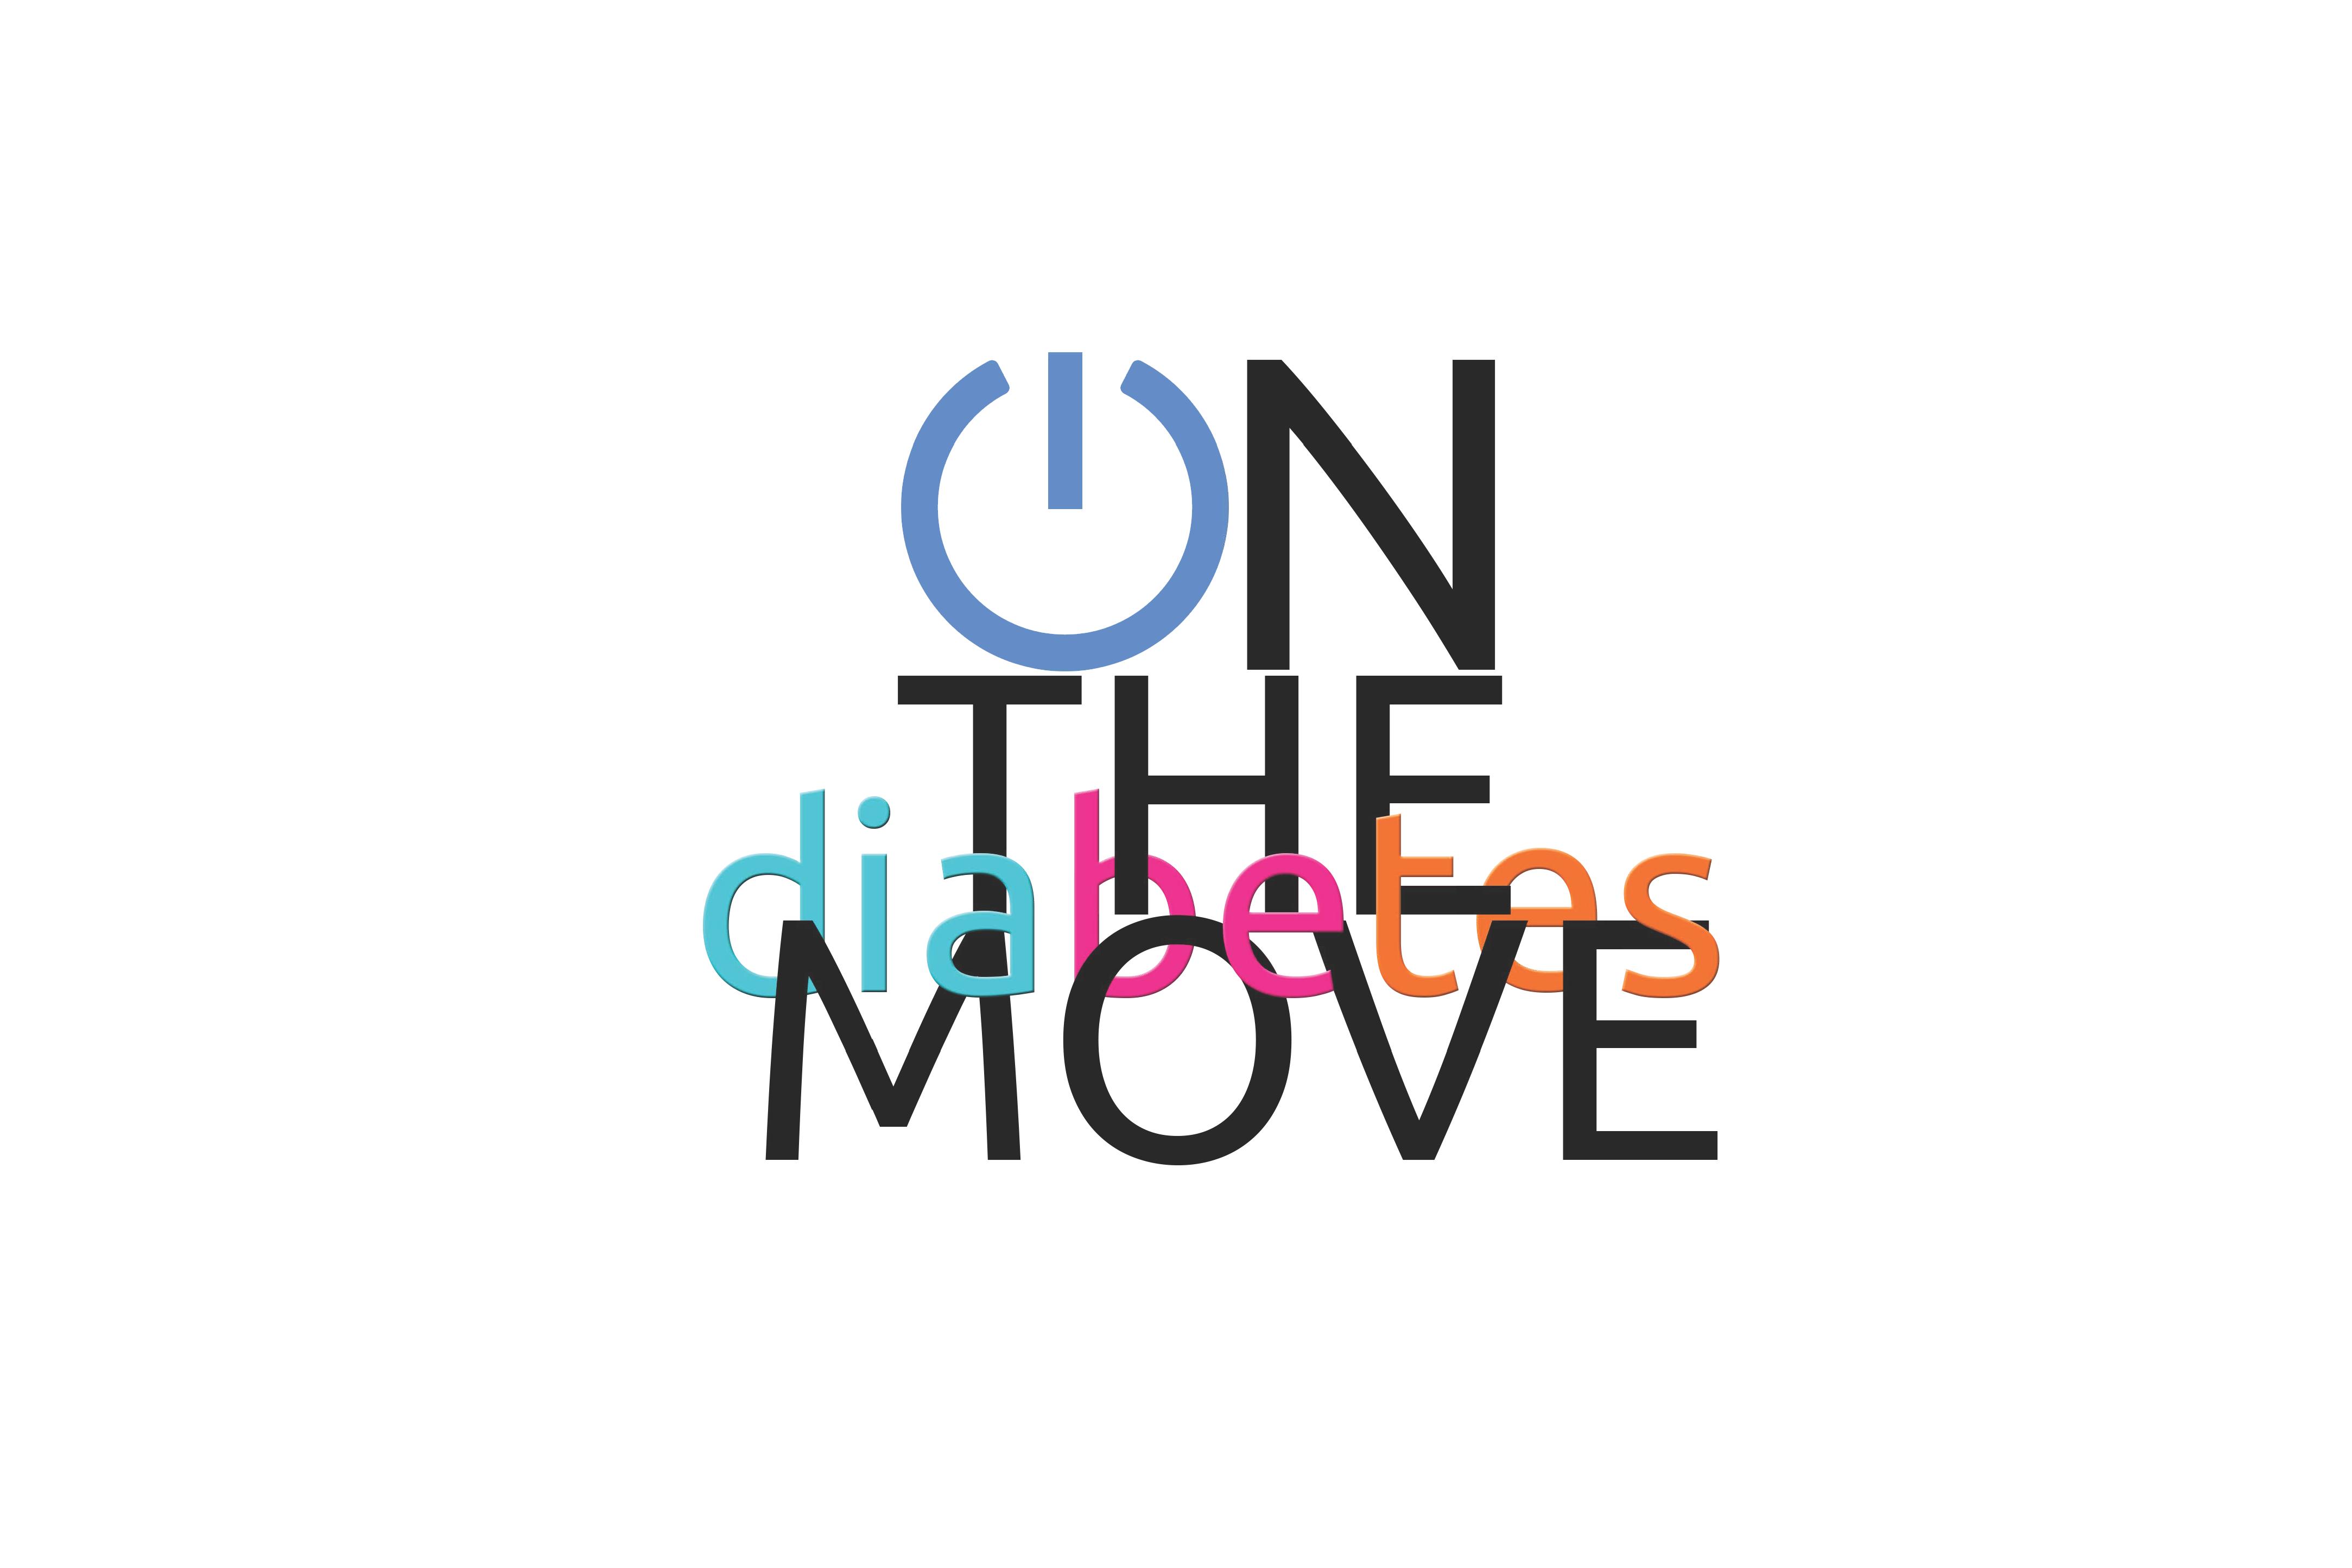 Diabetes on the Move: Βοήθησέ μας να προσθέσουμε μία καλή συνήθεια στη ζωή μας!